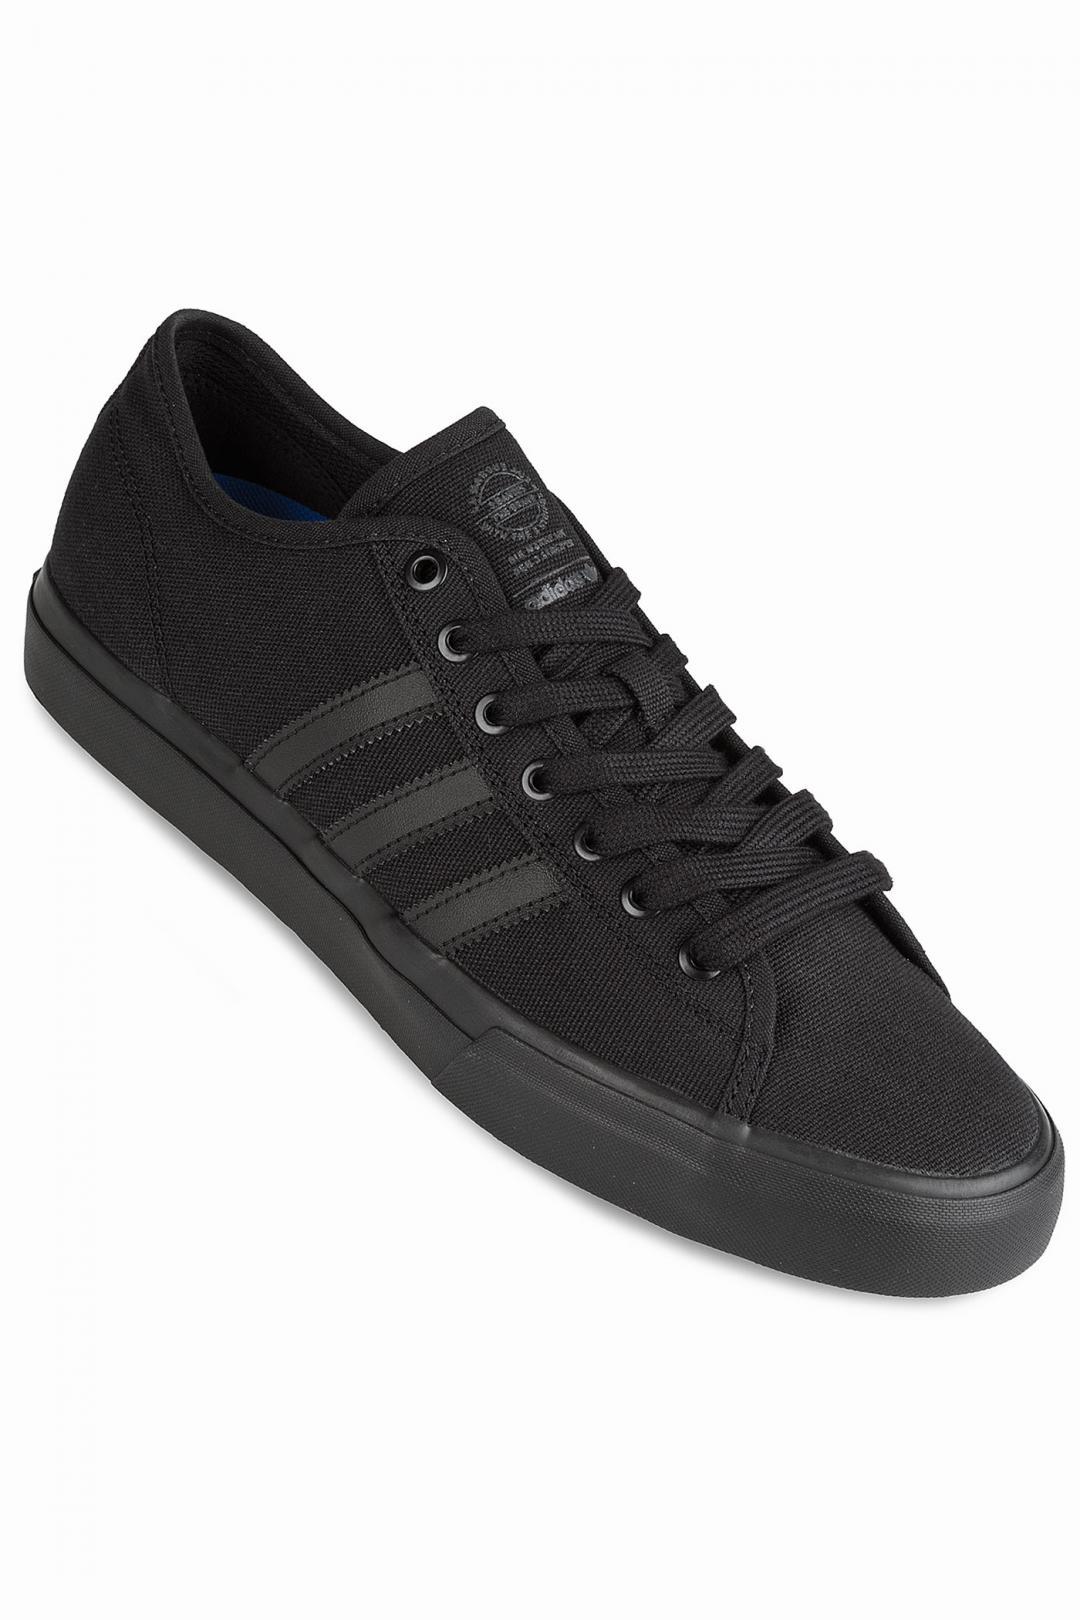 Uomo adidas Skateboarding Matchcourt RX core black core black core black   Scarpe da skate